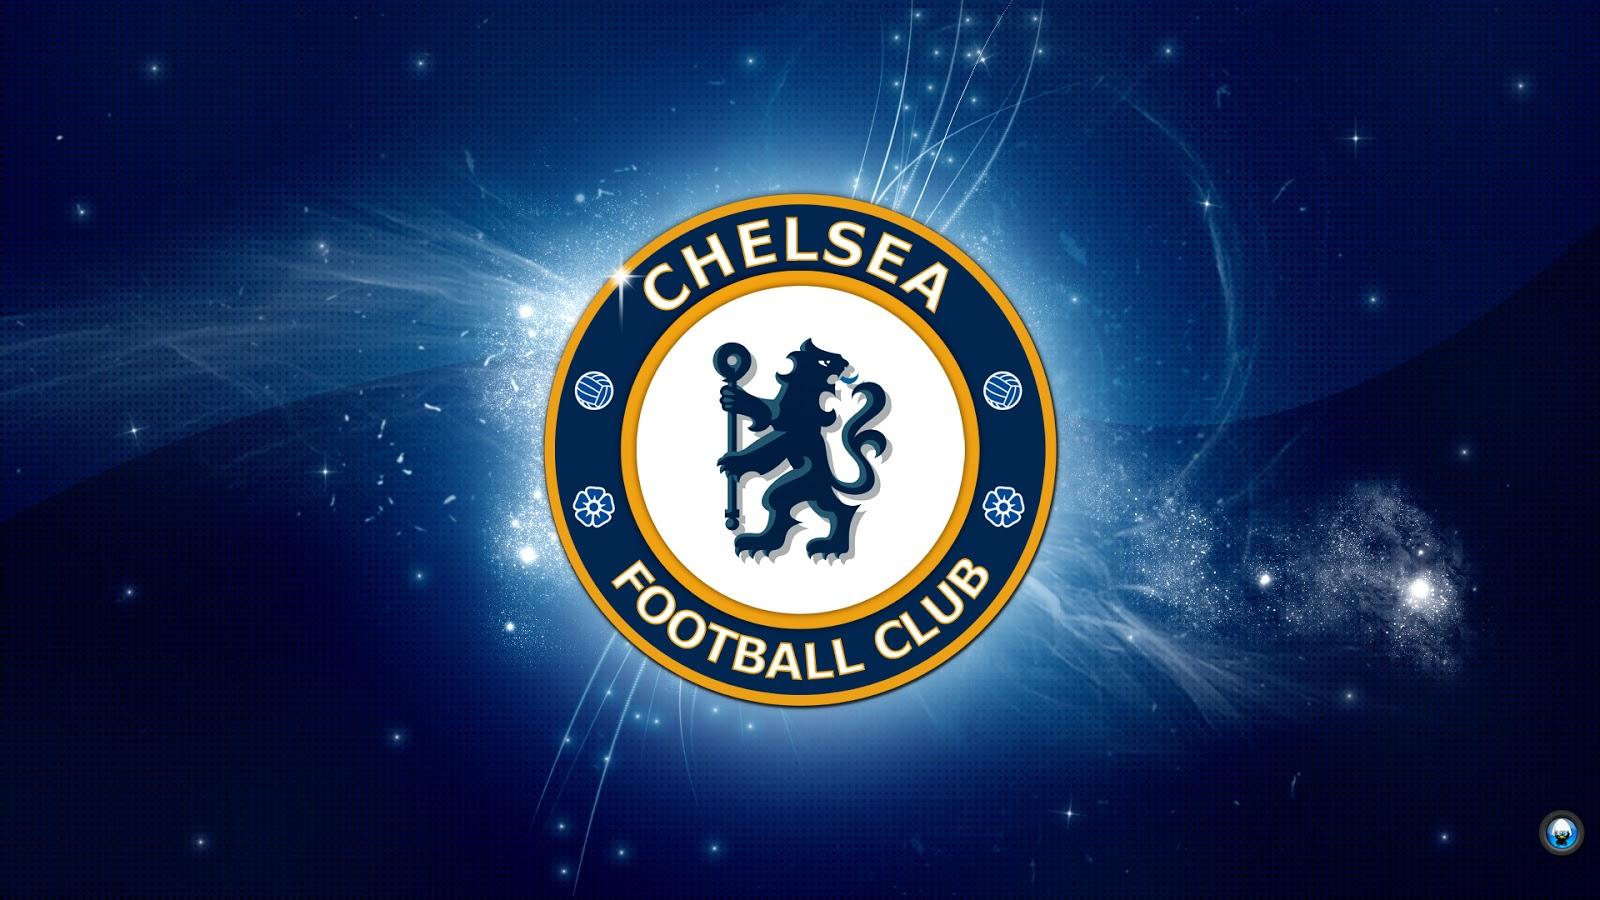 Chelsea FC 2013 Wallpapers HD 1600x900